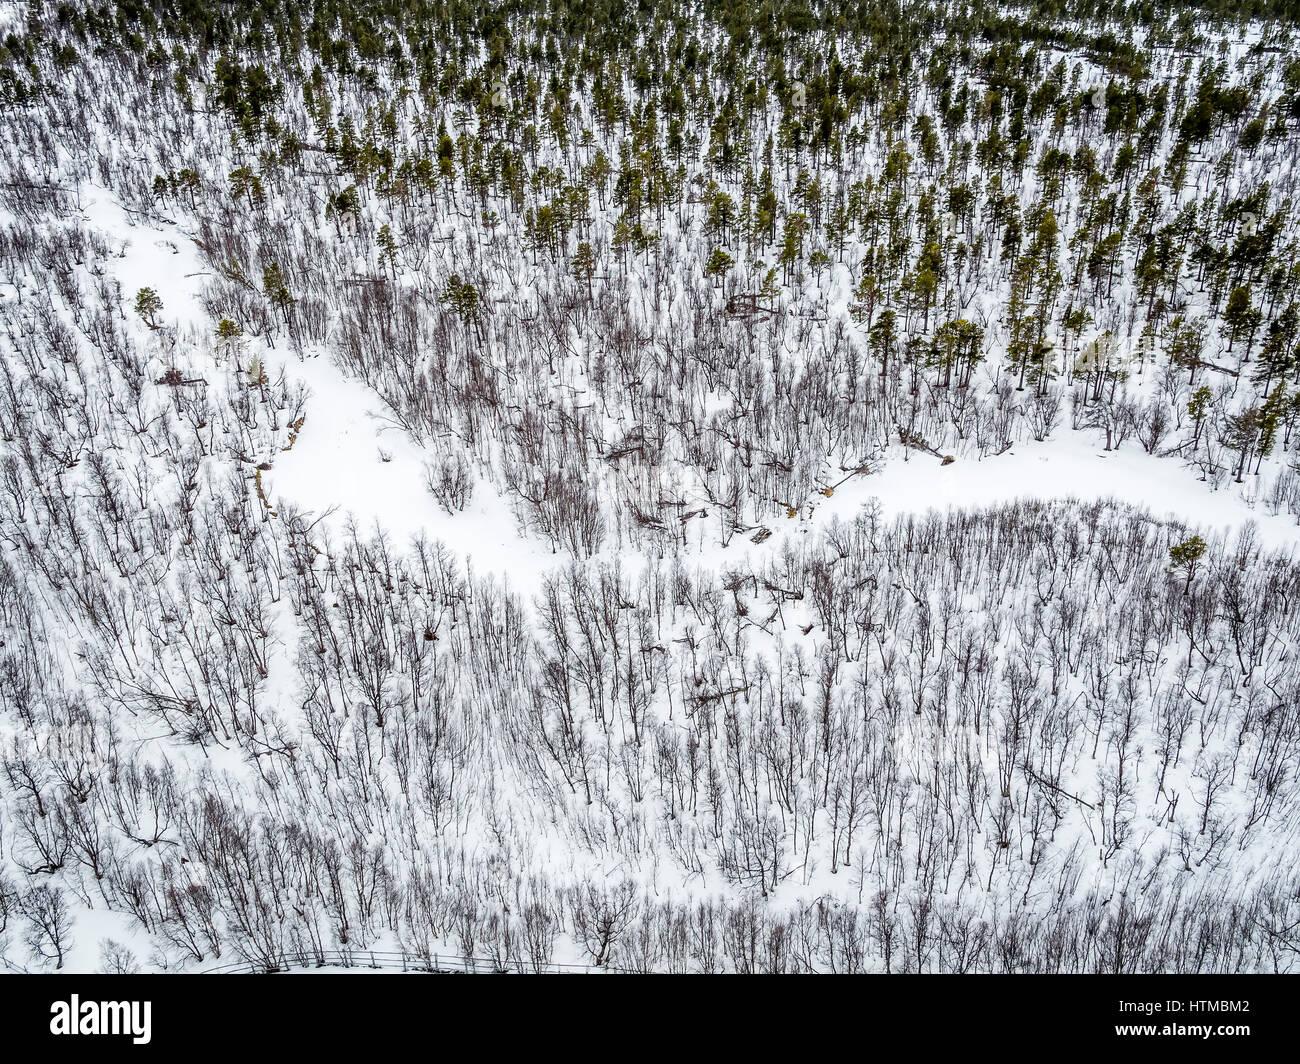 Forest in Laponia Area,  Stora Sjofallet National Park, Lapland, Sweden. Stock Photo